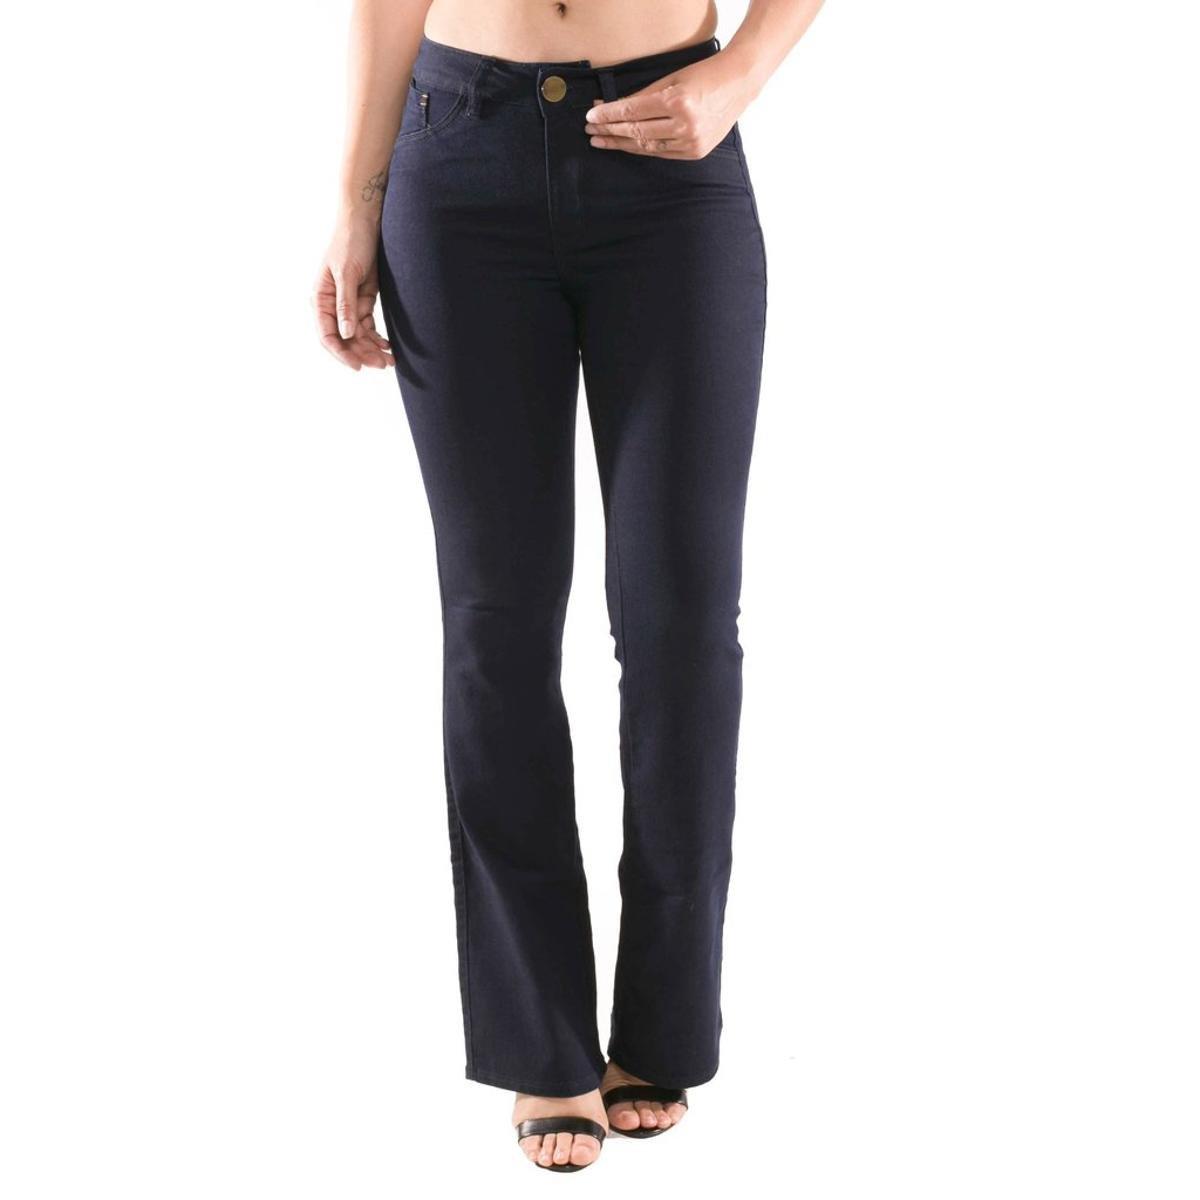 b1f169ae9 Calça Jeans Osmoze Mid Rise Flare Low Feminina - Compre Agora | Zattini